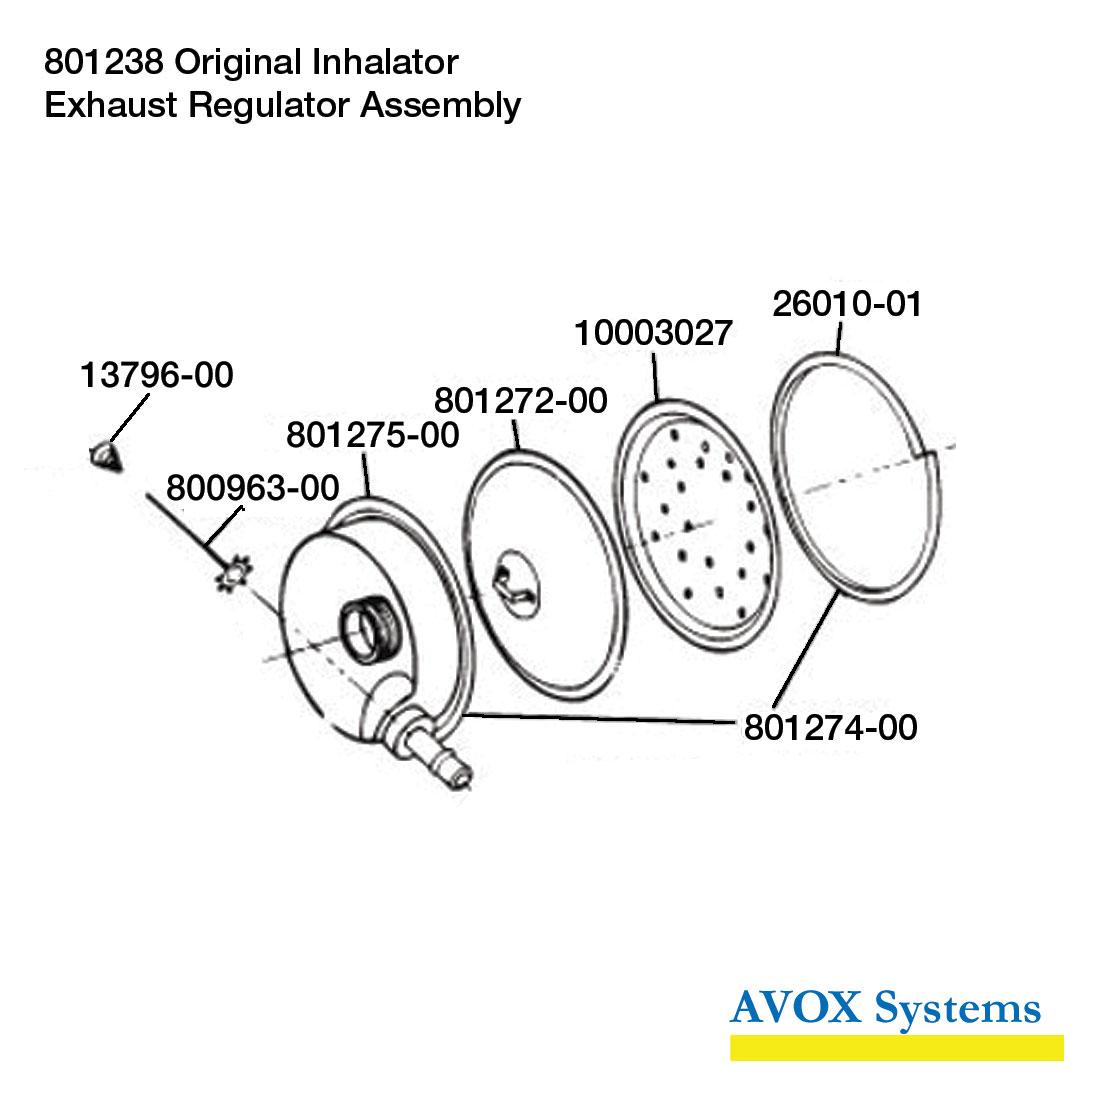 Exhaust Regulator Assembly Parts 801238 Inhalator Without 1st Hyperbaric Welding Diagram Avox Original Demand